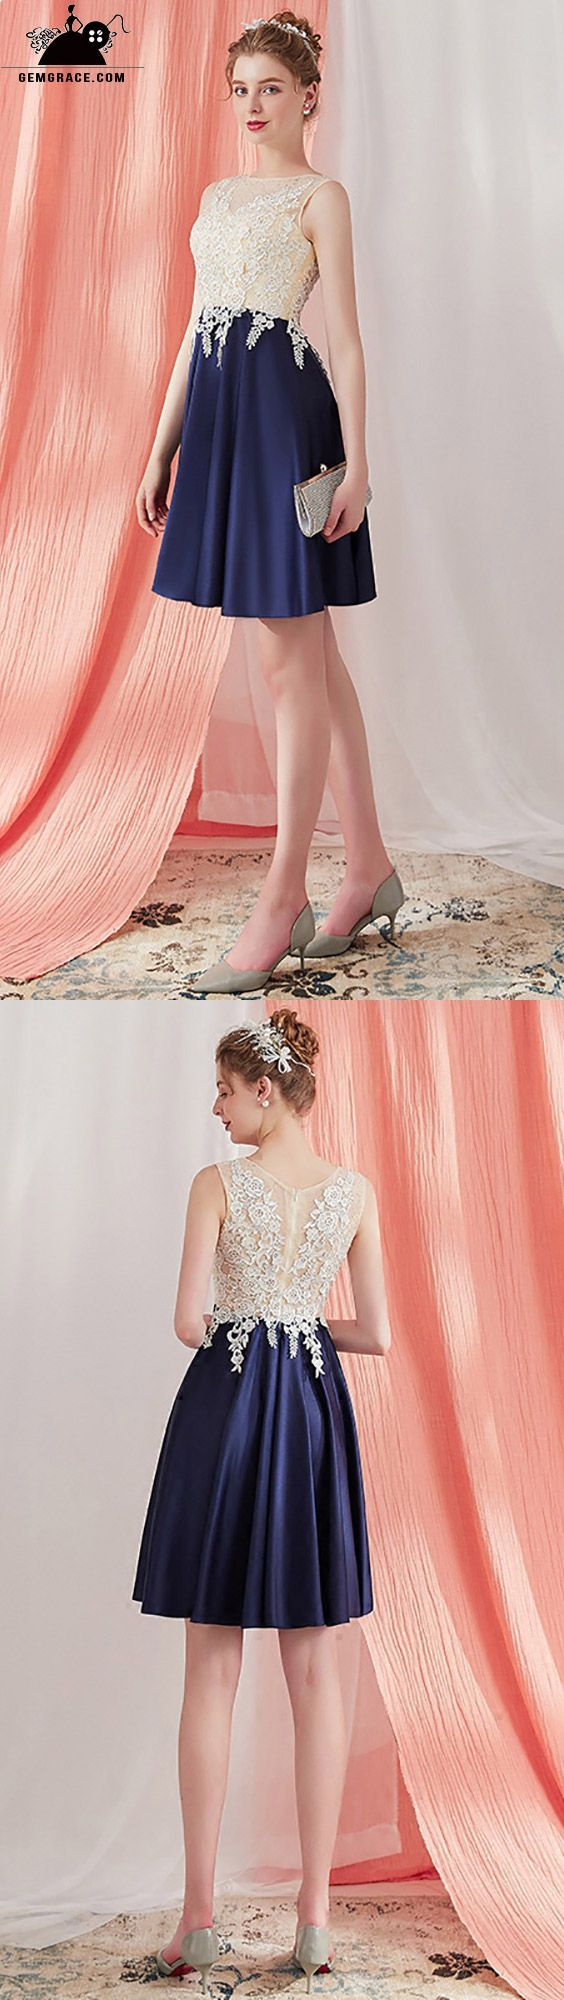 Elegant lace aline short homecoming party dress navy blue ama